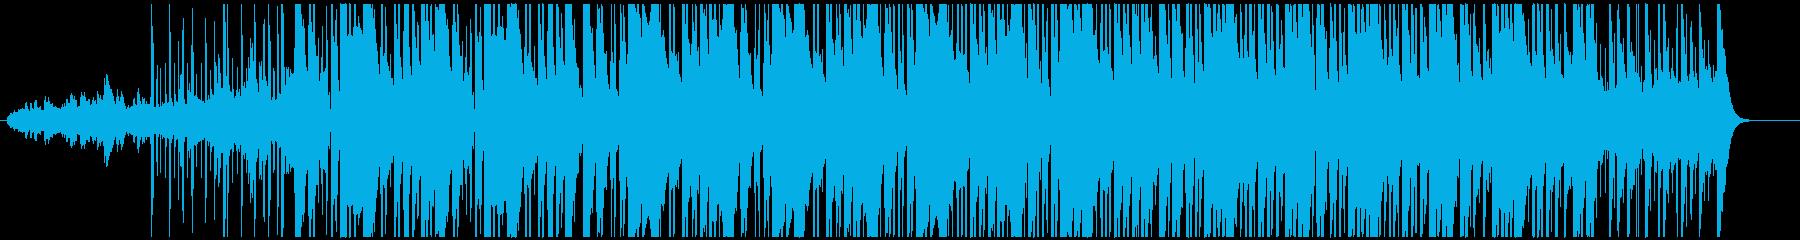 FutureでLo-FiなHipHopの再生済みの波形